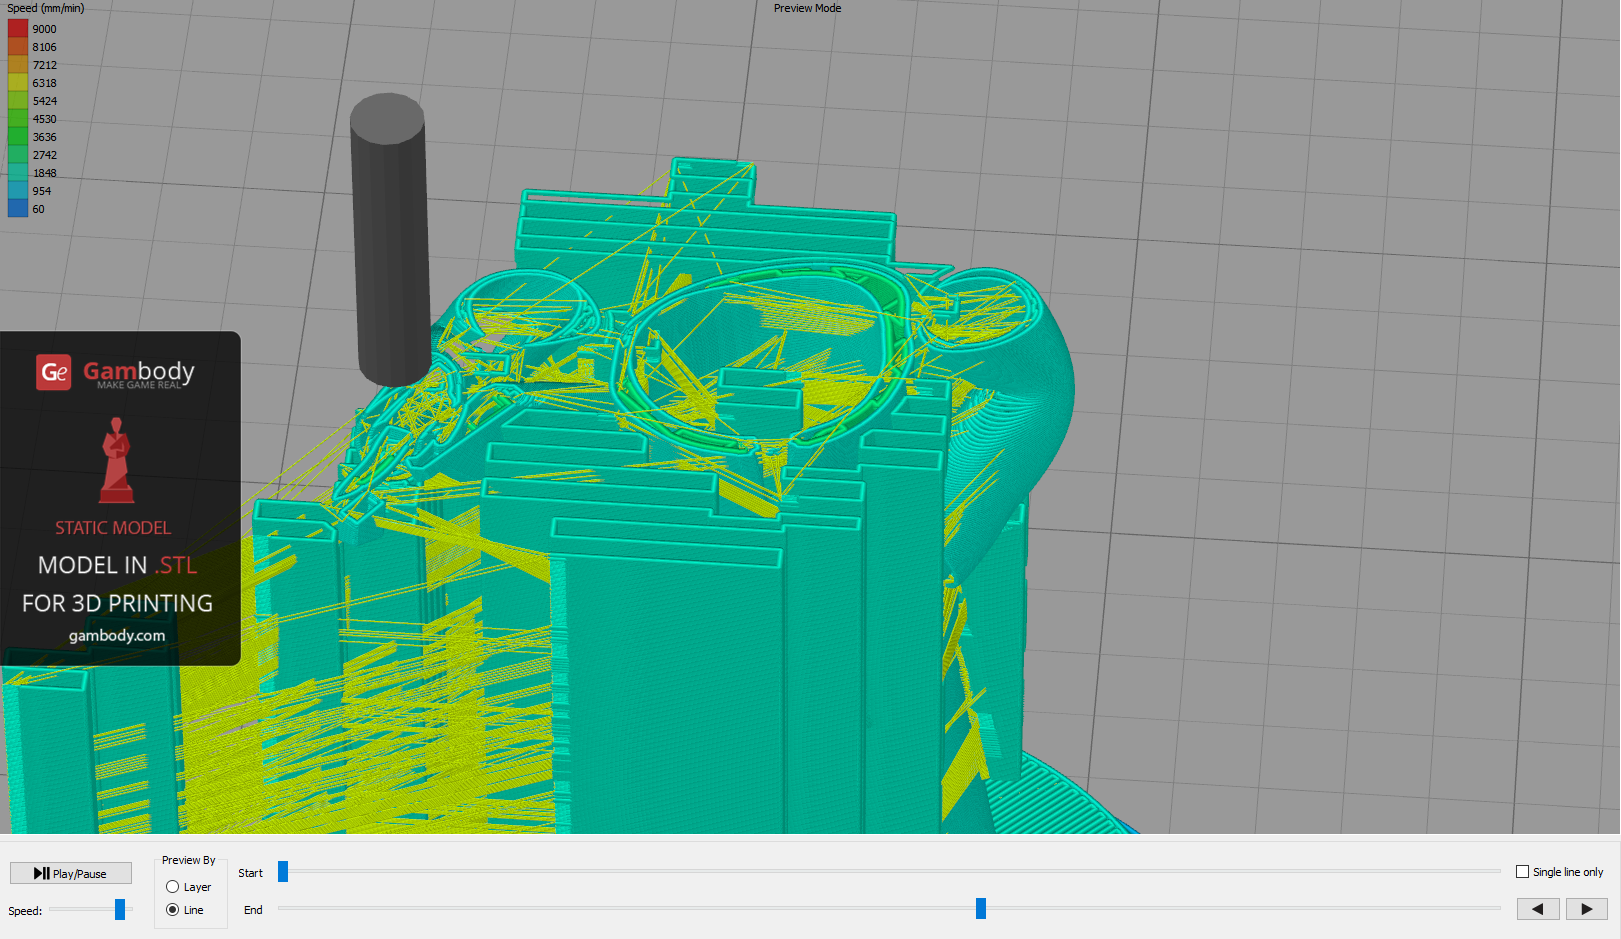 vault-boy-3d-model-slicing-spoftware -8